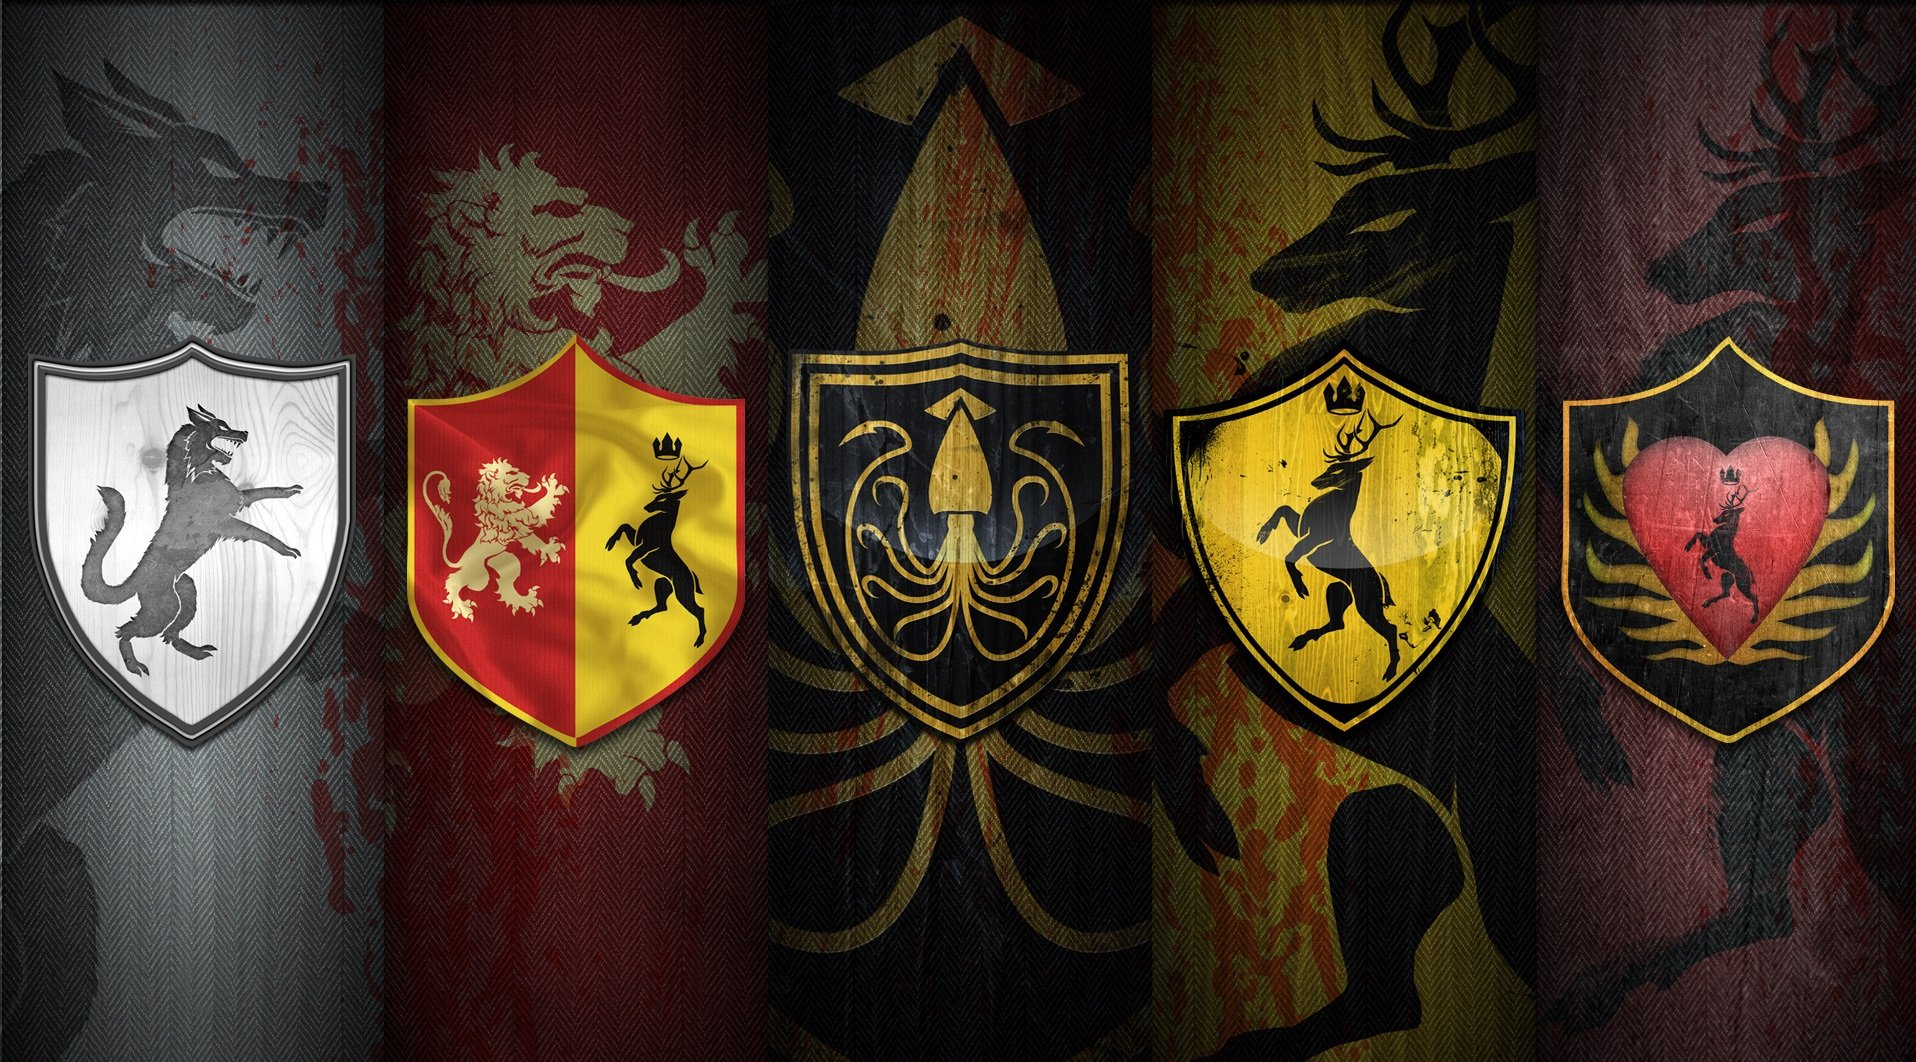 Game of Thrones (Игра престолов) - Изображение 1